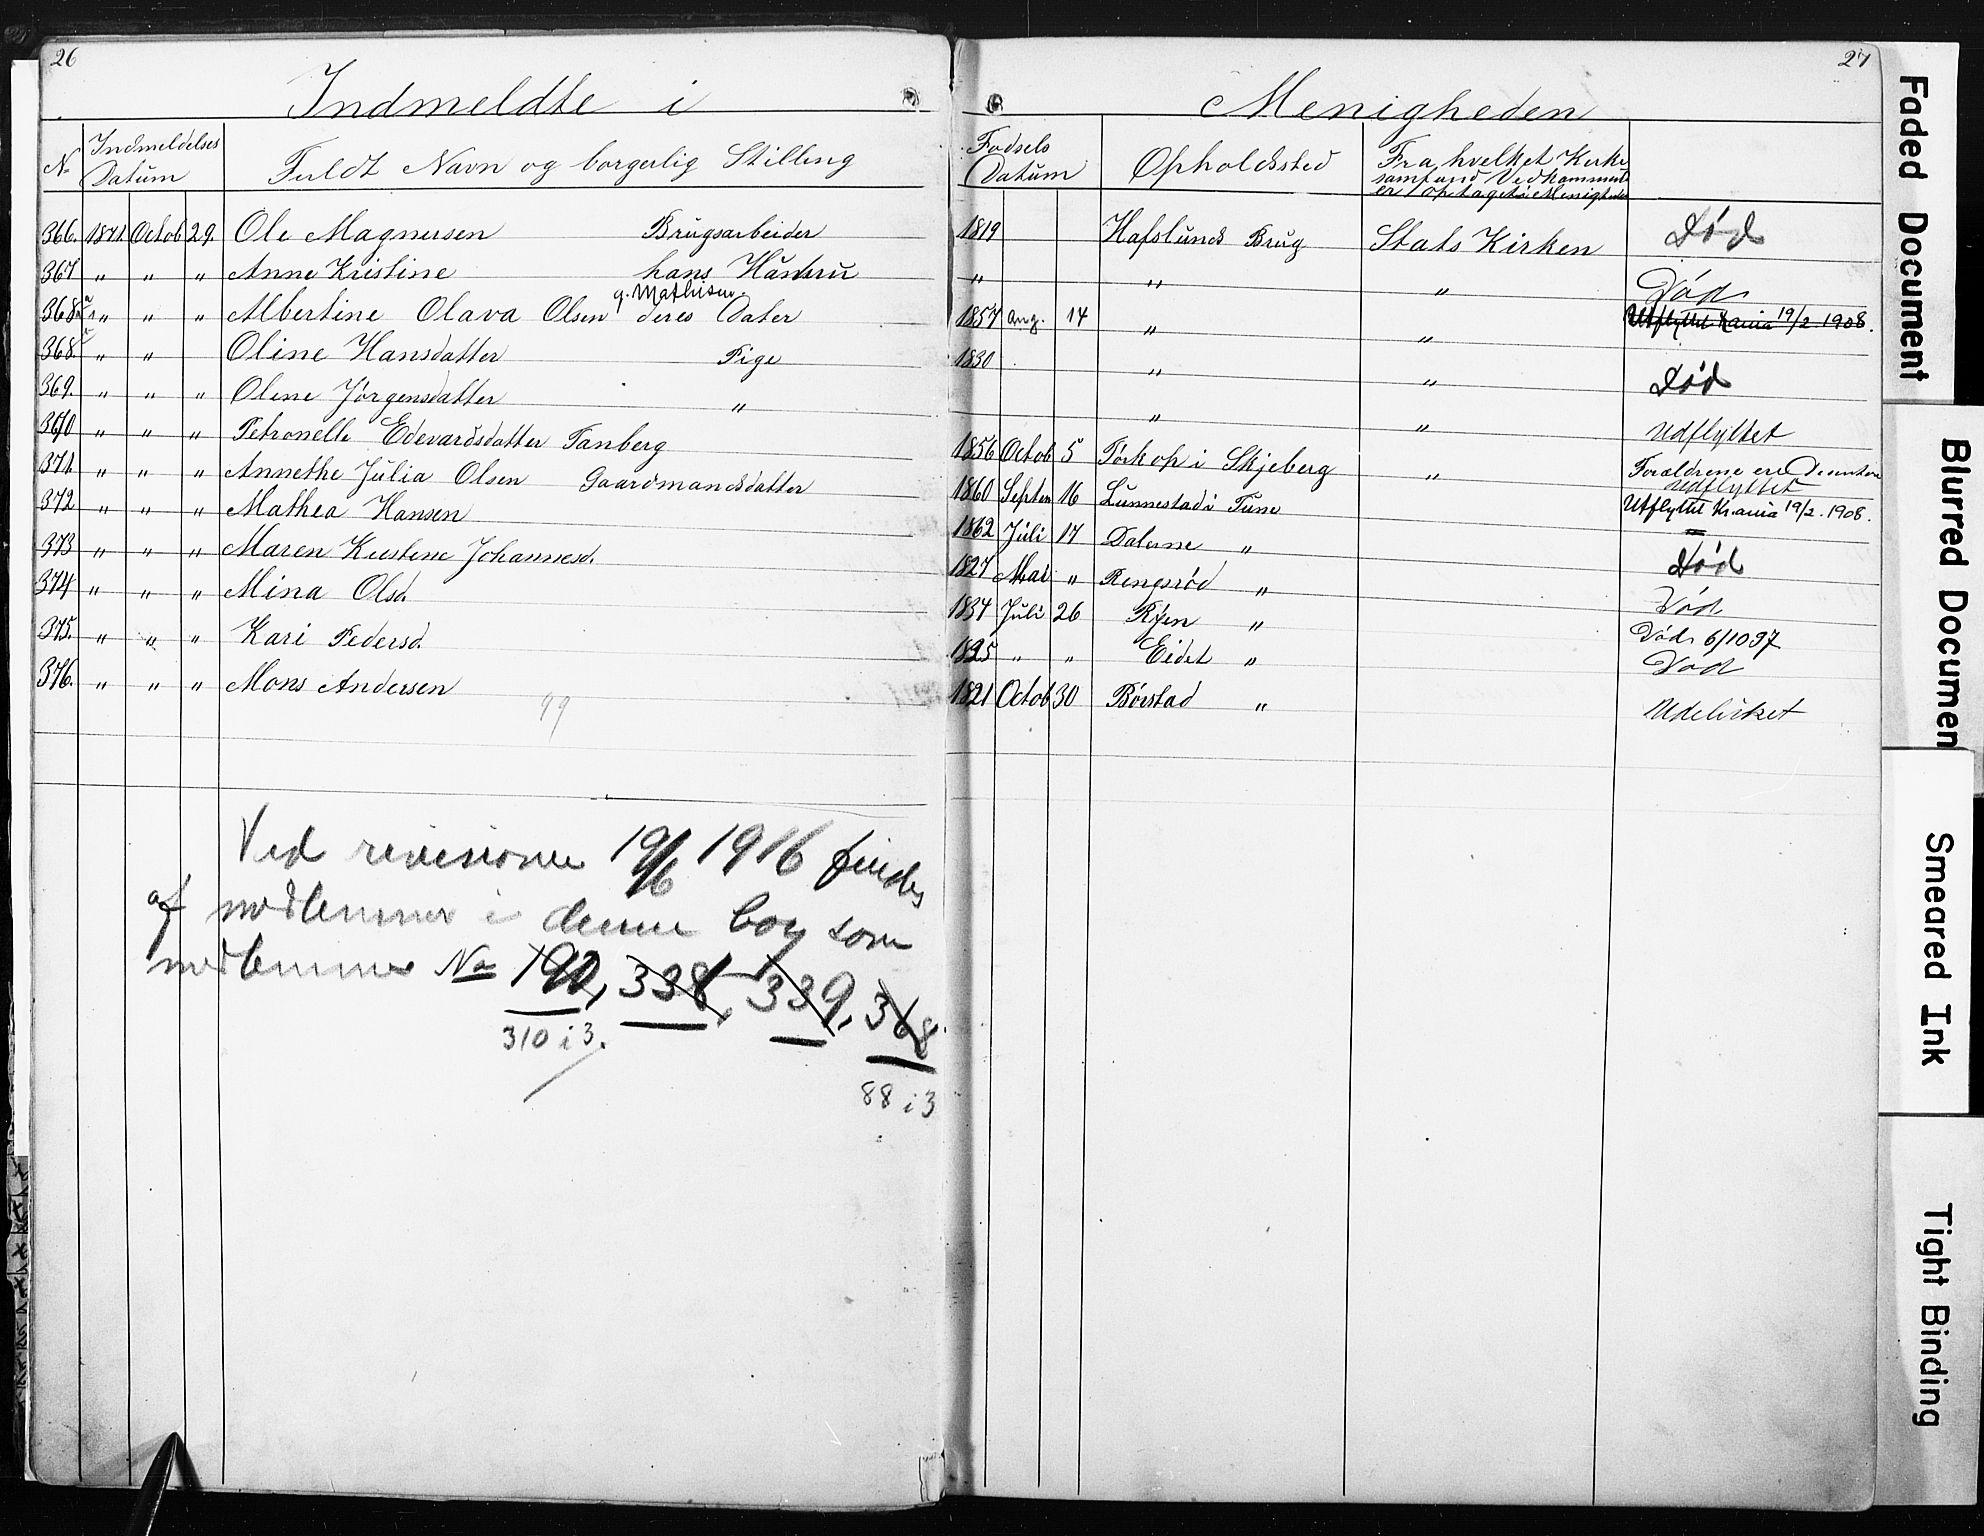 SAO, Sarpsborg metodistkirke, A/L0001: Dissenter register no. 1, 1856-1875, p. 26-27